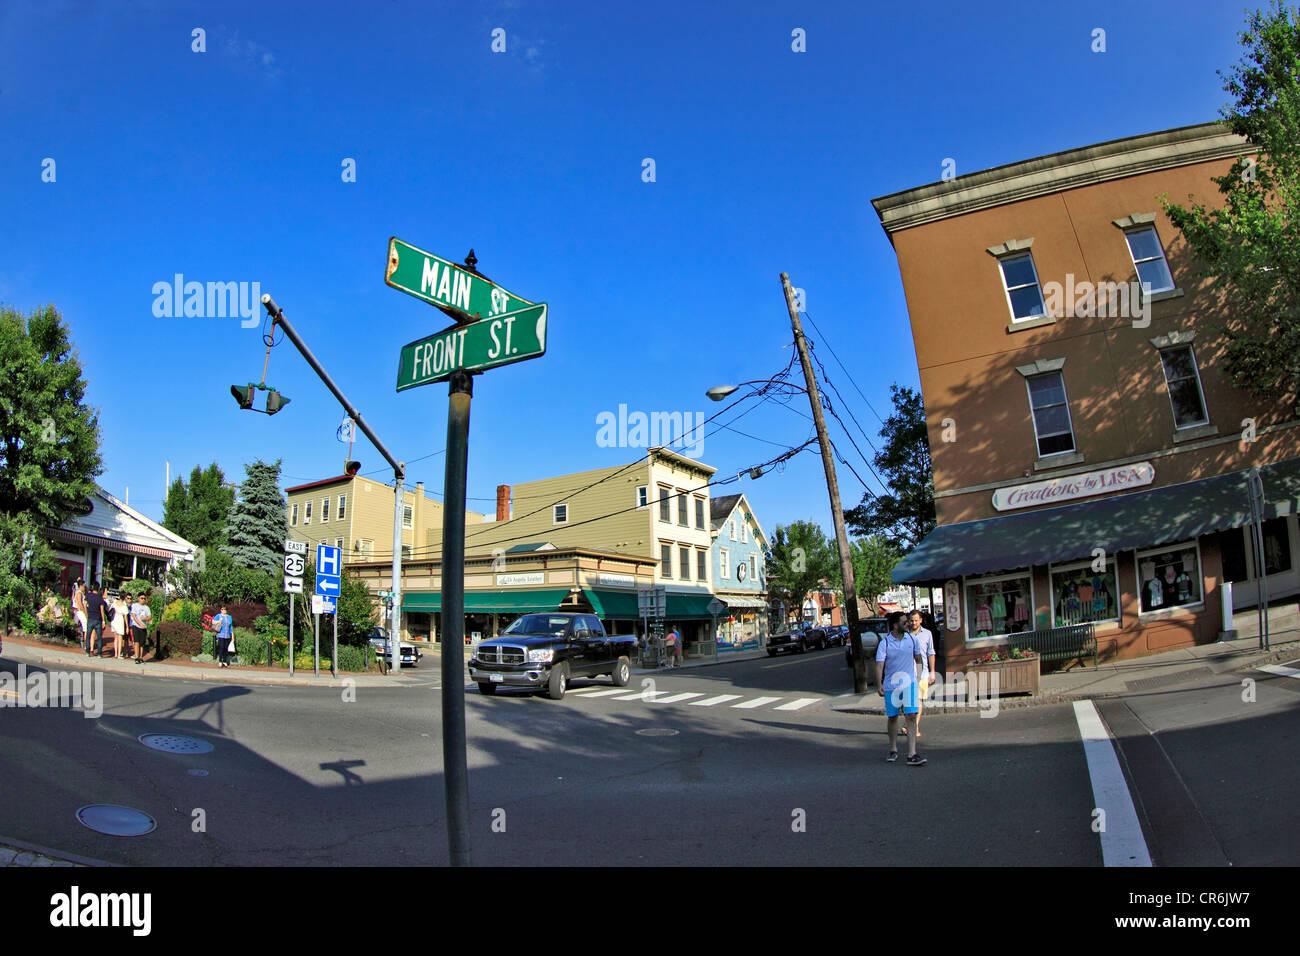 Main St. Village of Greenport Long Island New York - Stock Image